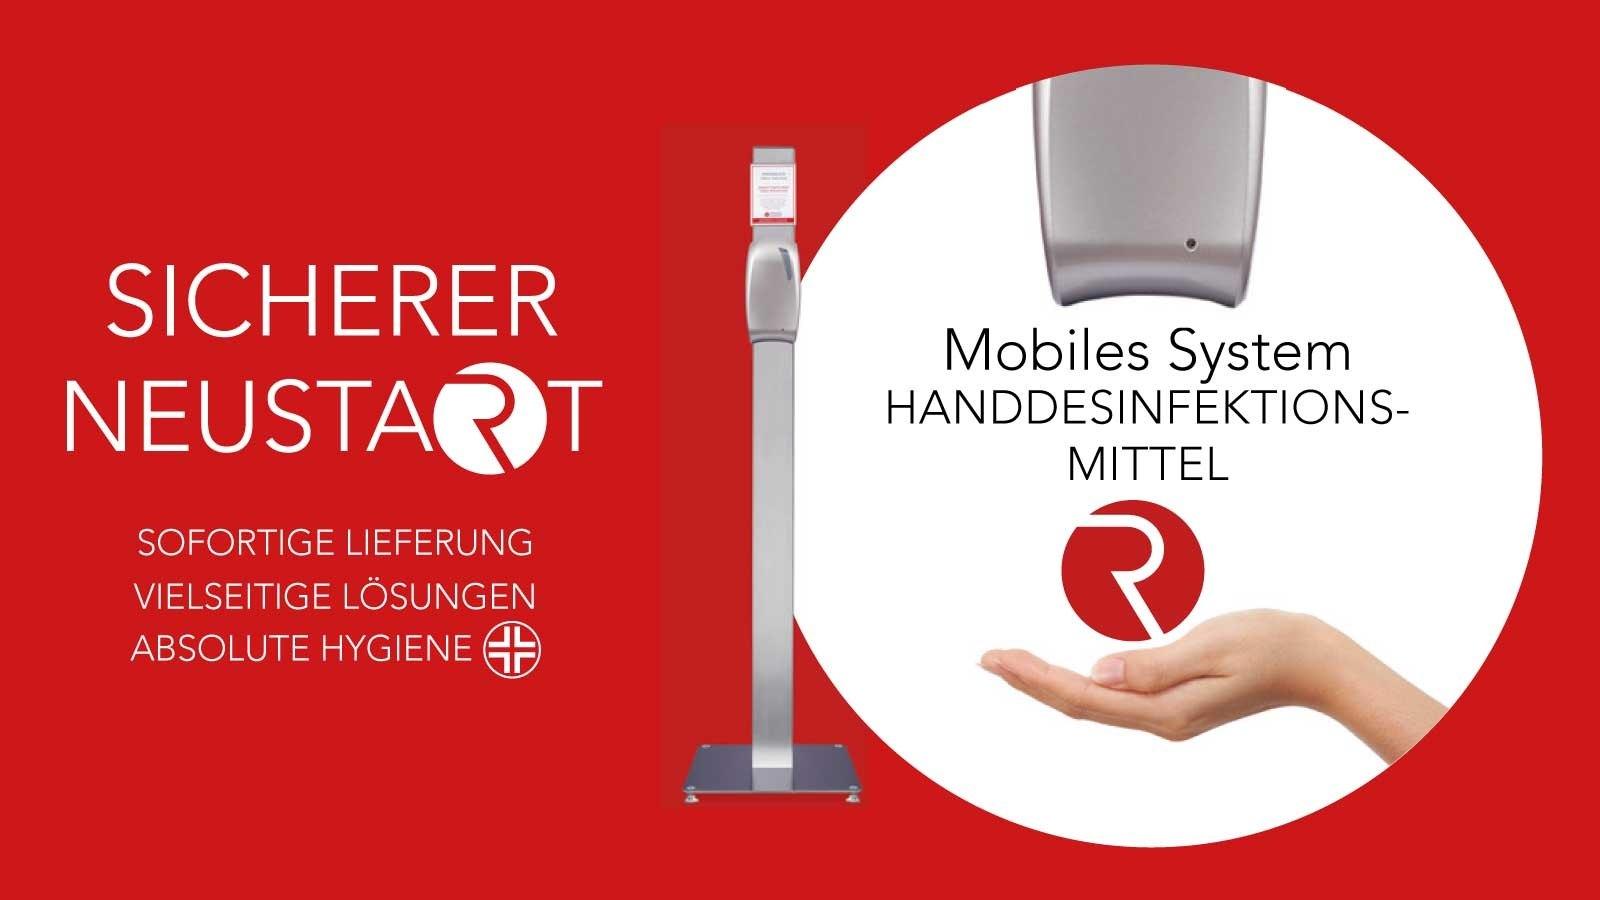 Mobiles System Handdesinfektionsmittel